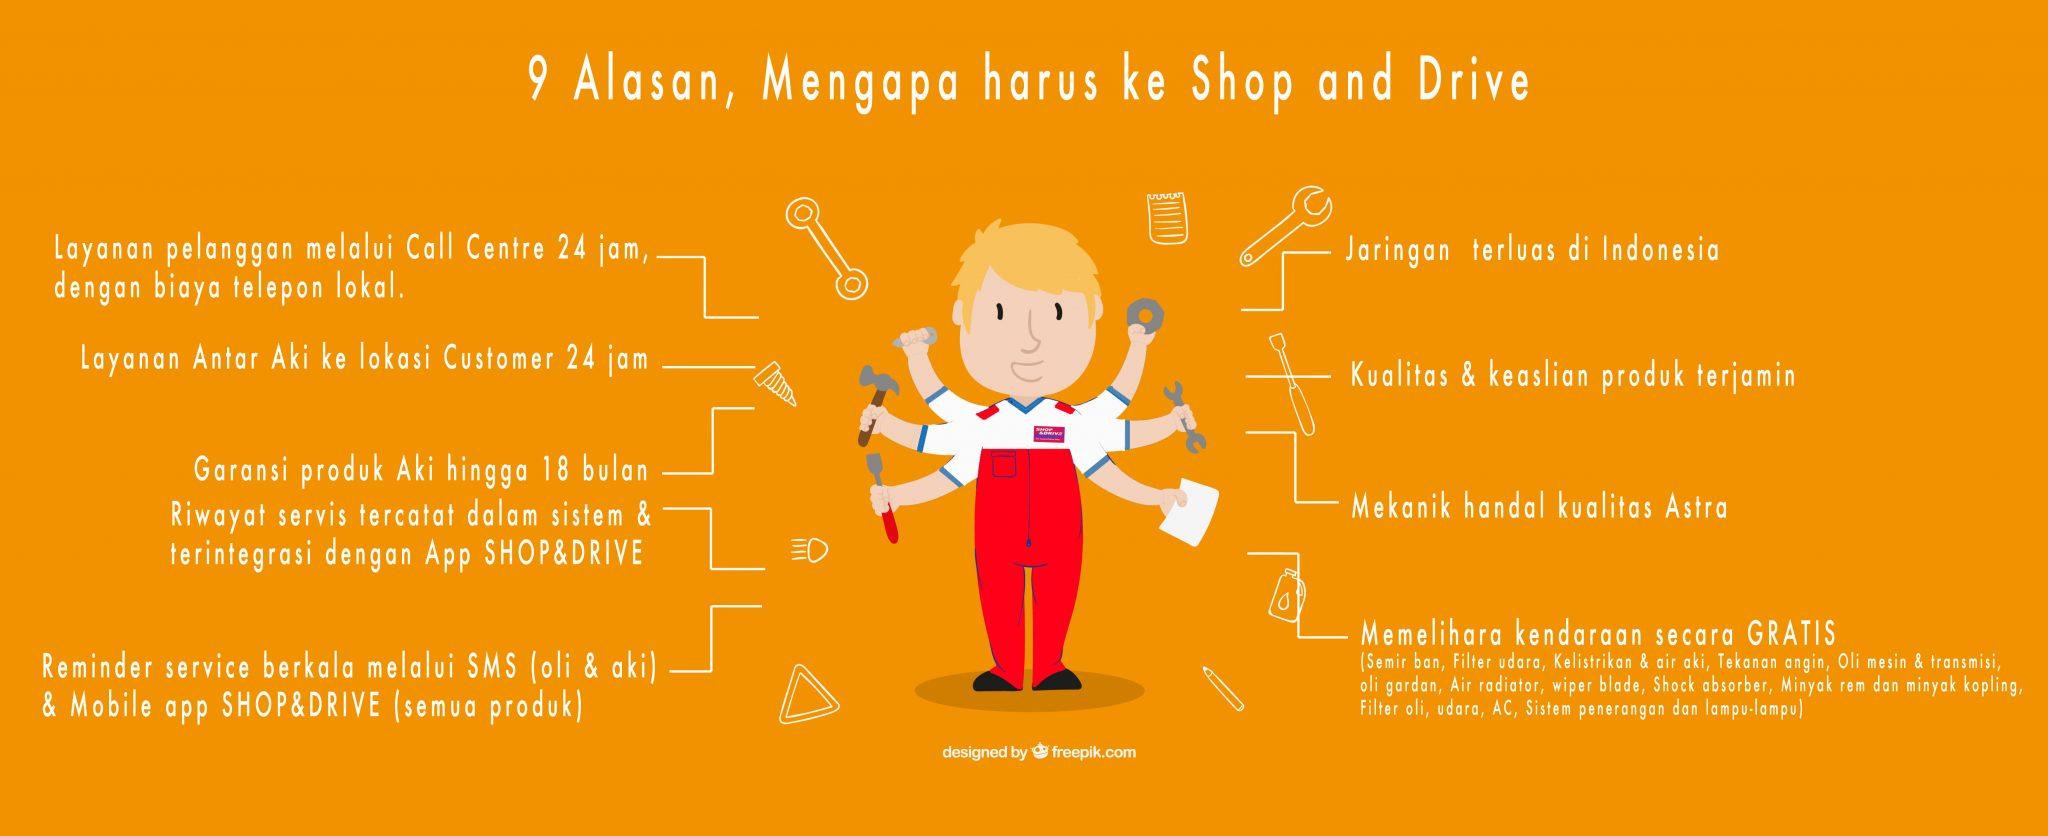 mengapa-shop-and-drive